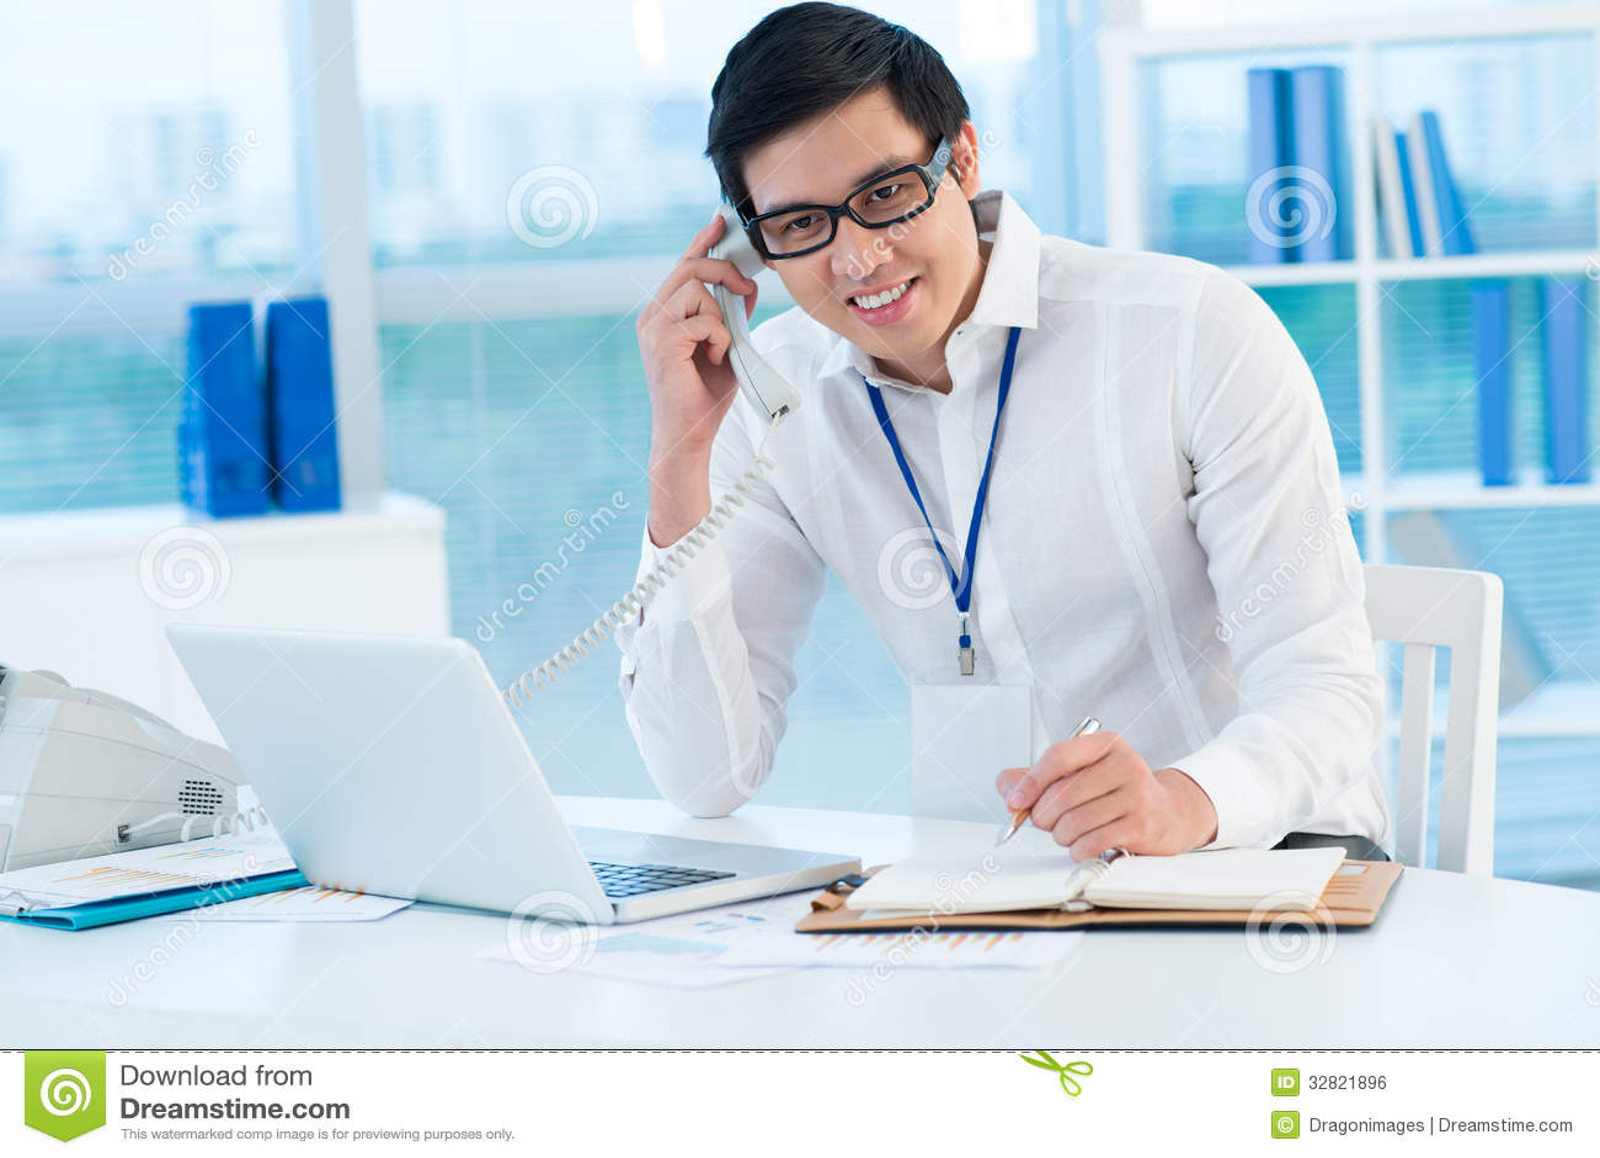 Male Secretary Stock Photo Image Of Consultant